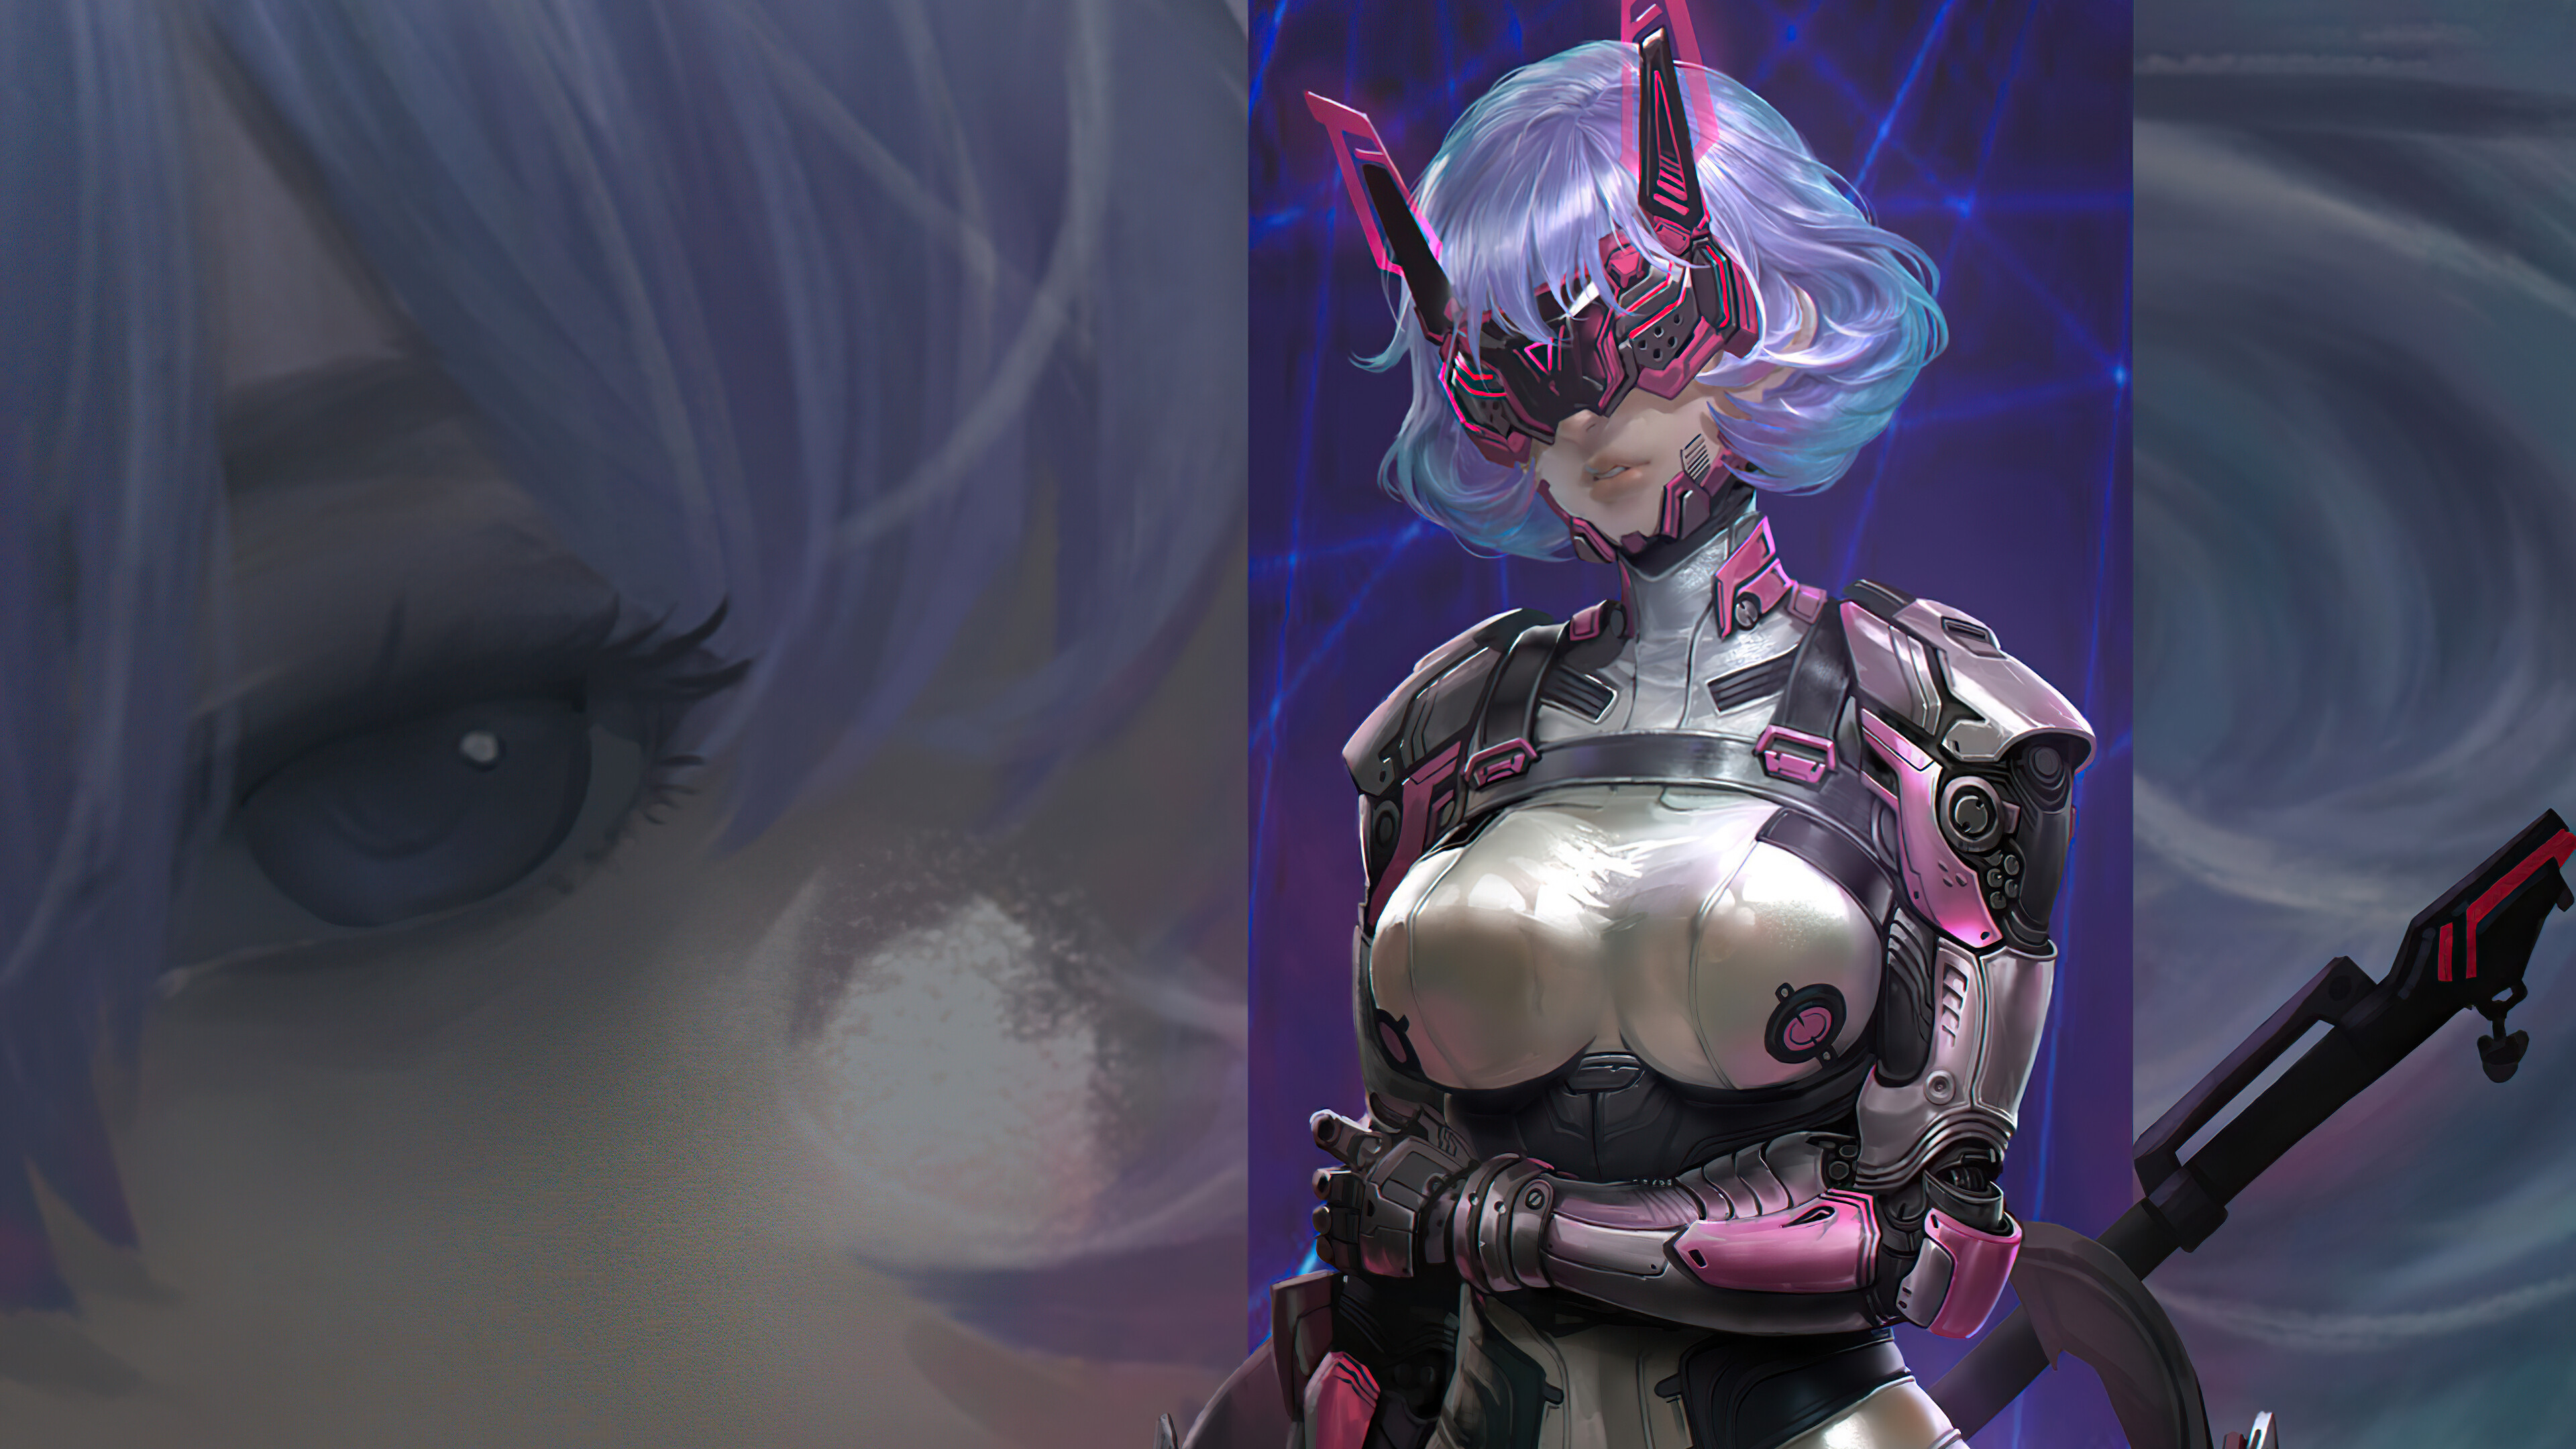 Fondos de pantalla Chica guerrera estilo cyberpunk